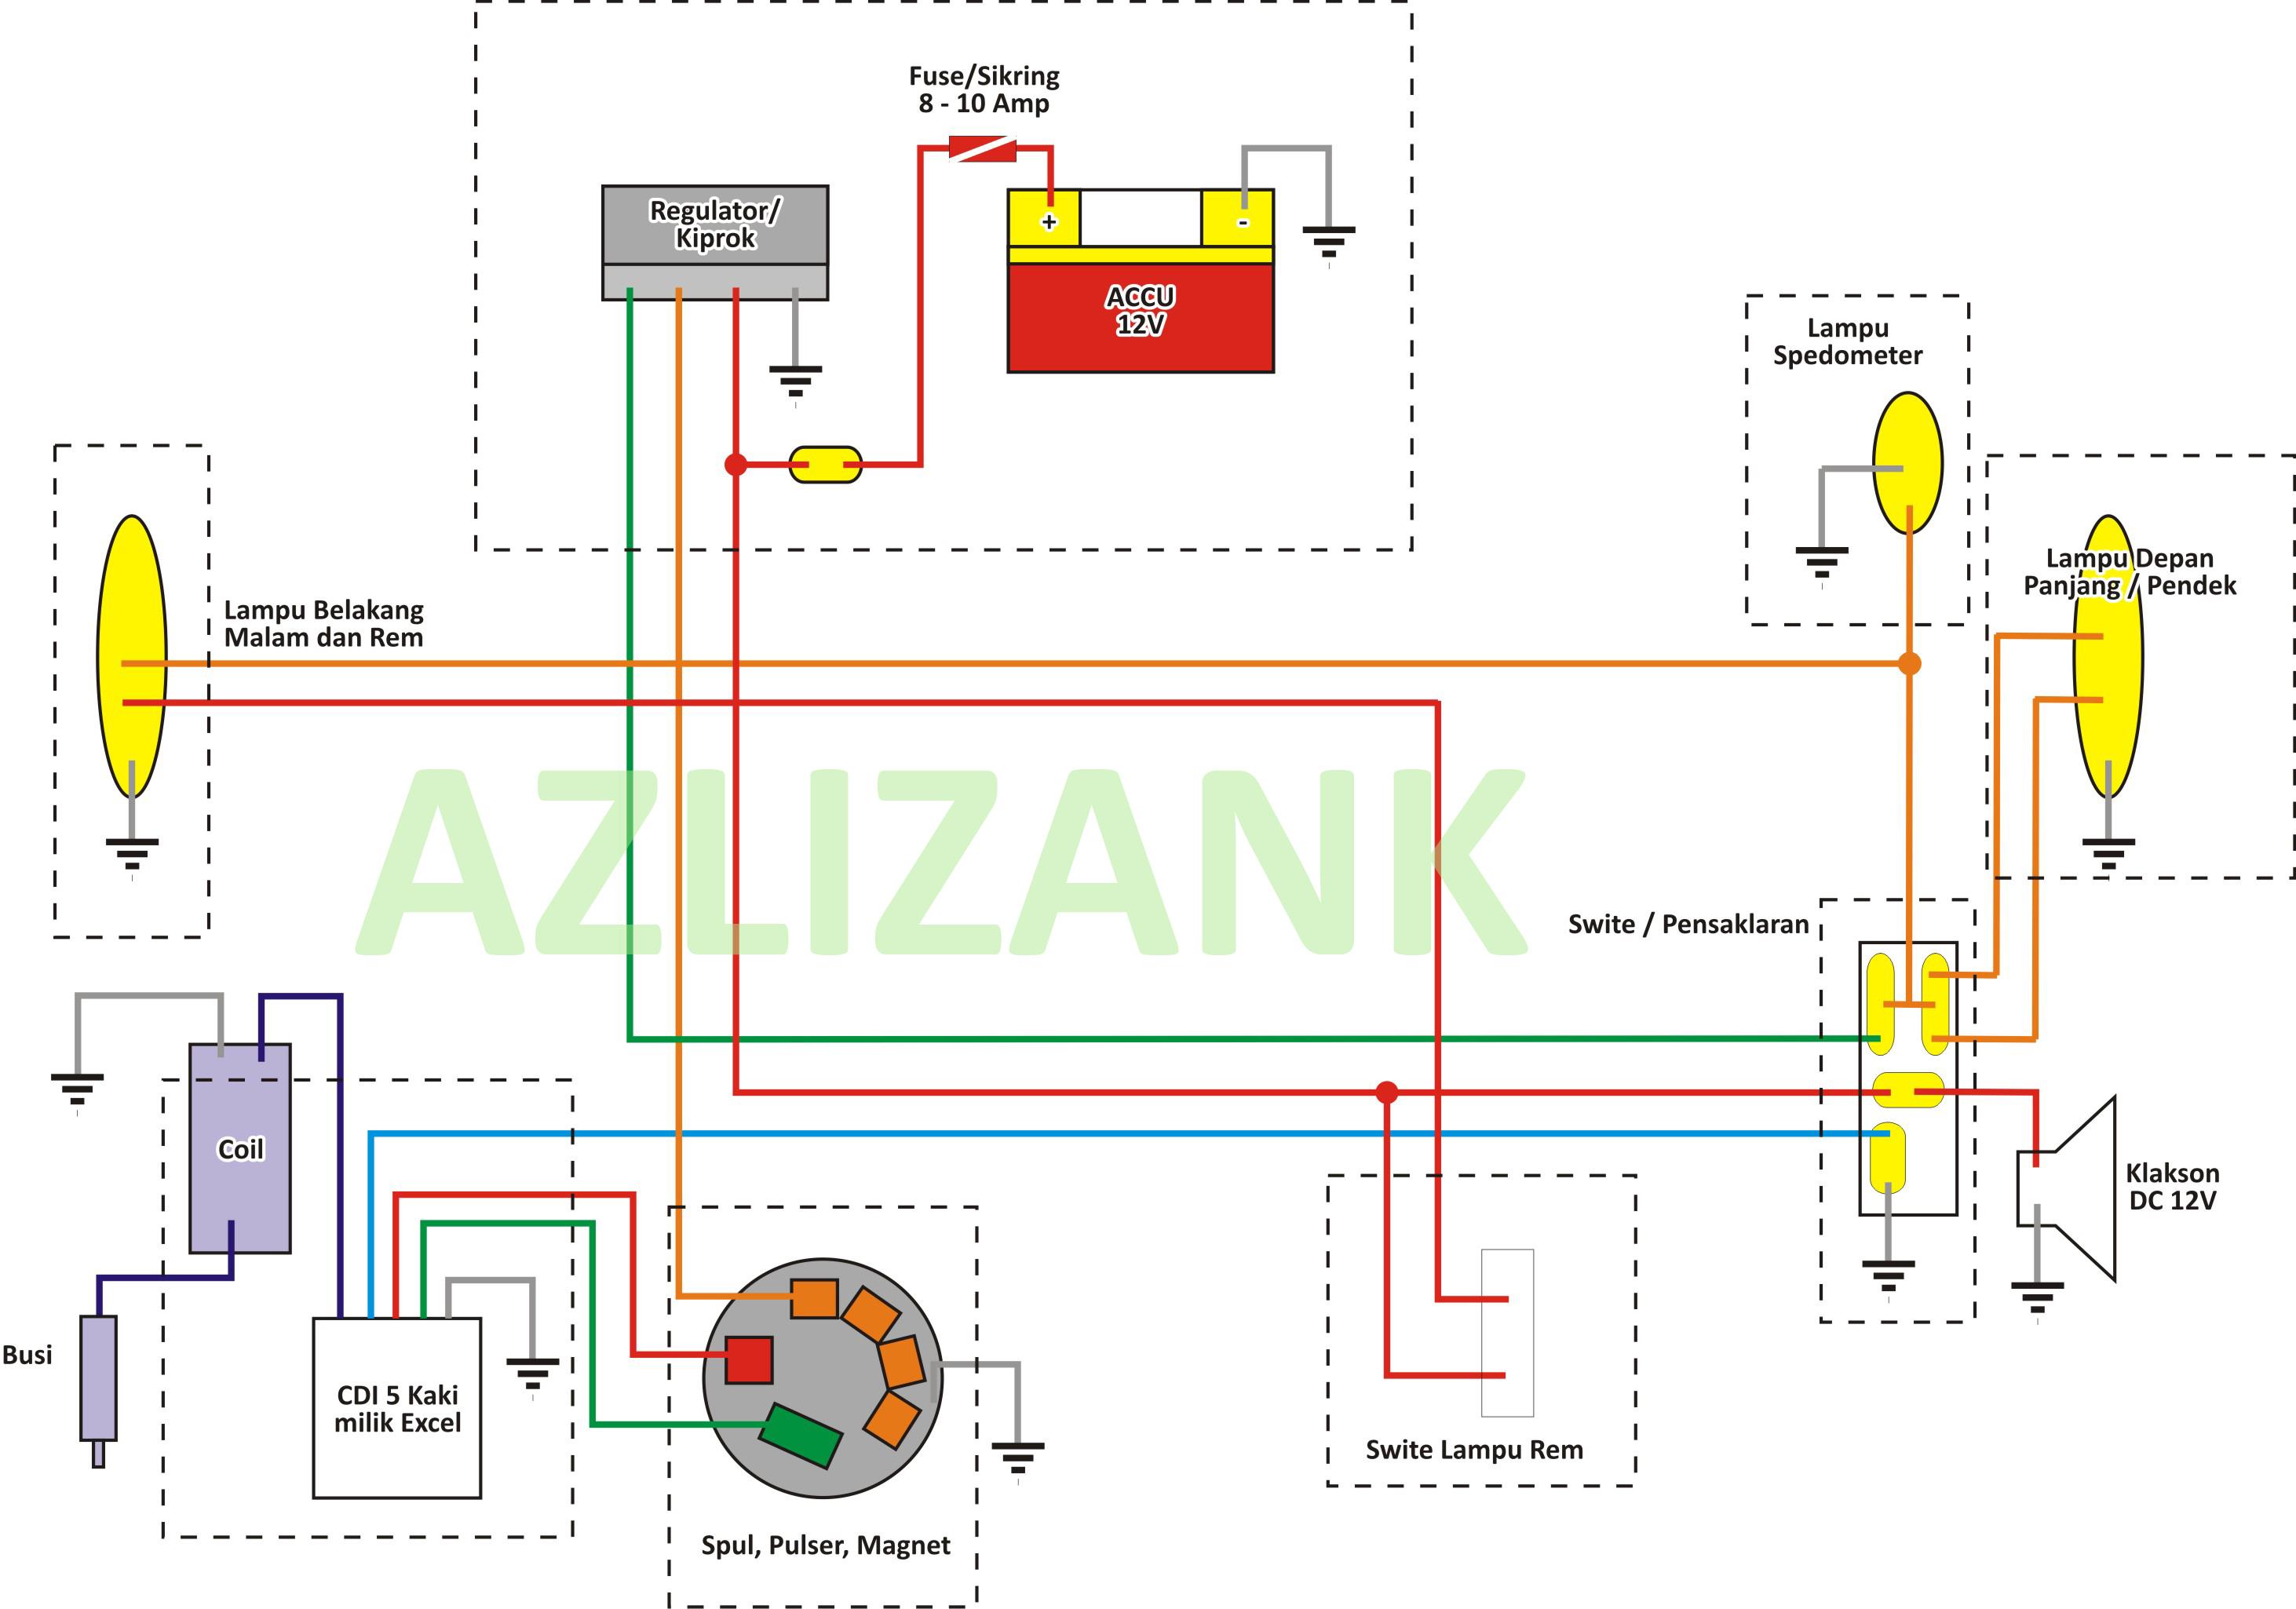 medium resolution of vespa vo wiring diagram wiring library tao tao 50cc moped wiring diagram vespa vo moped wiring diagram